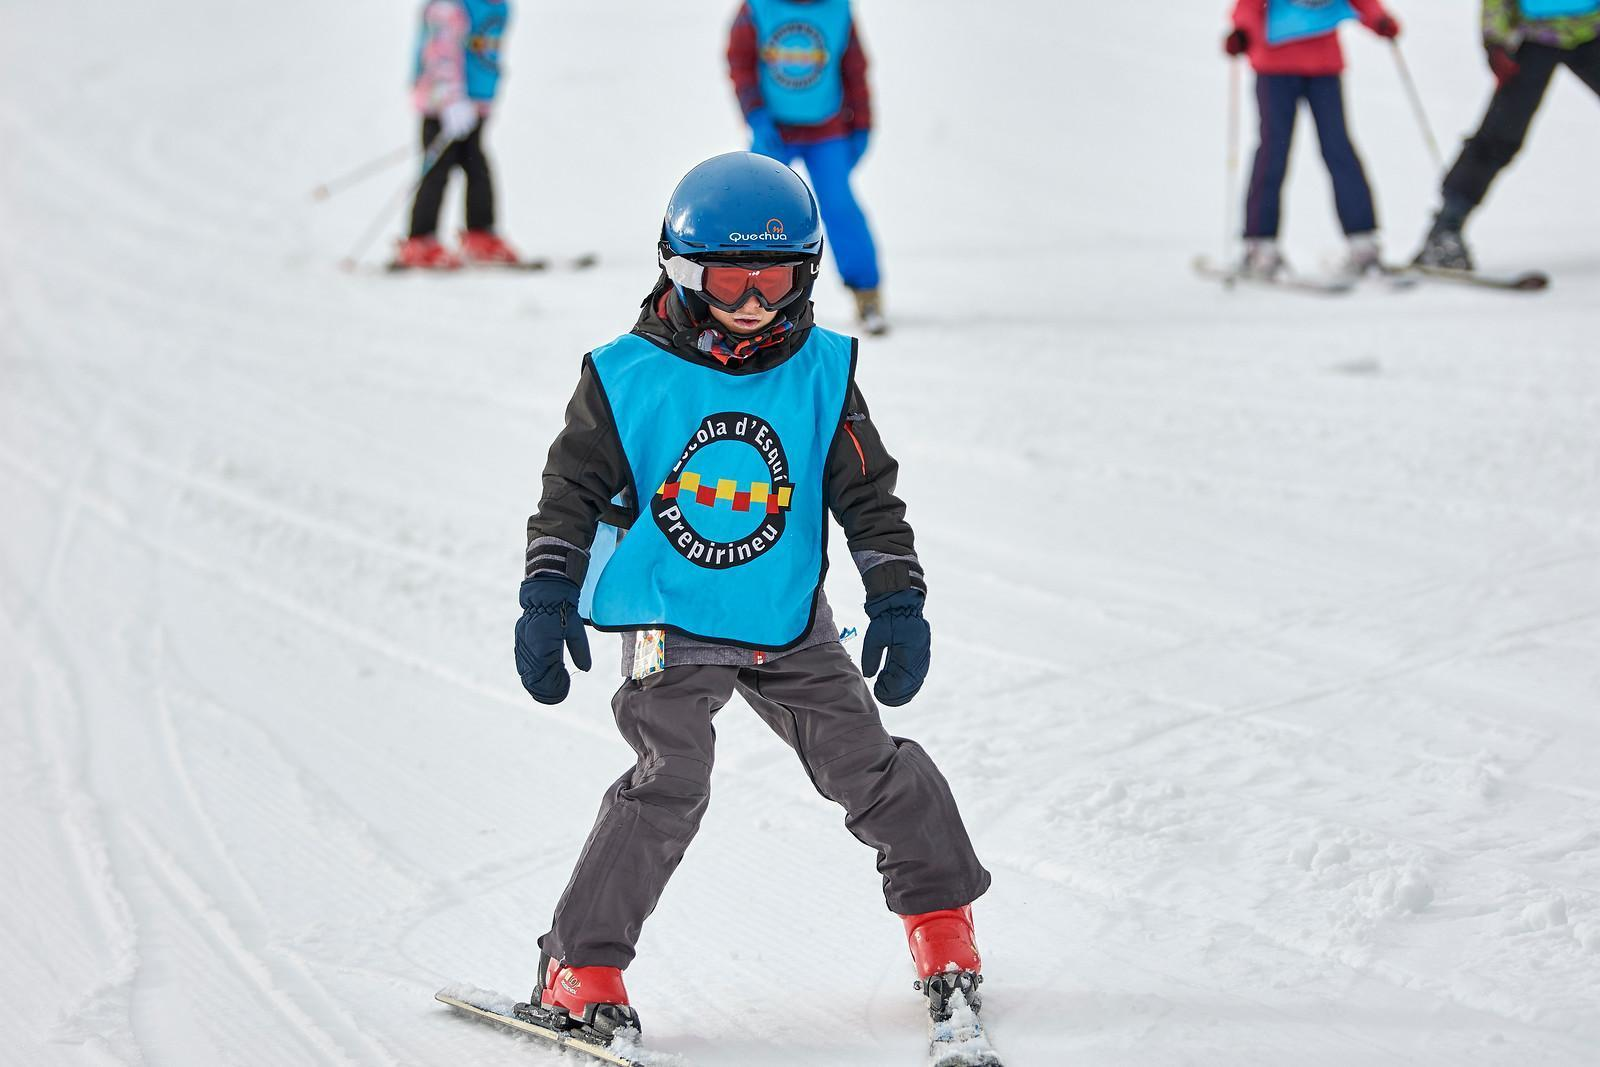 Bateig d'esquí (de 4 a 6 anys) a Tavascan